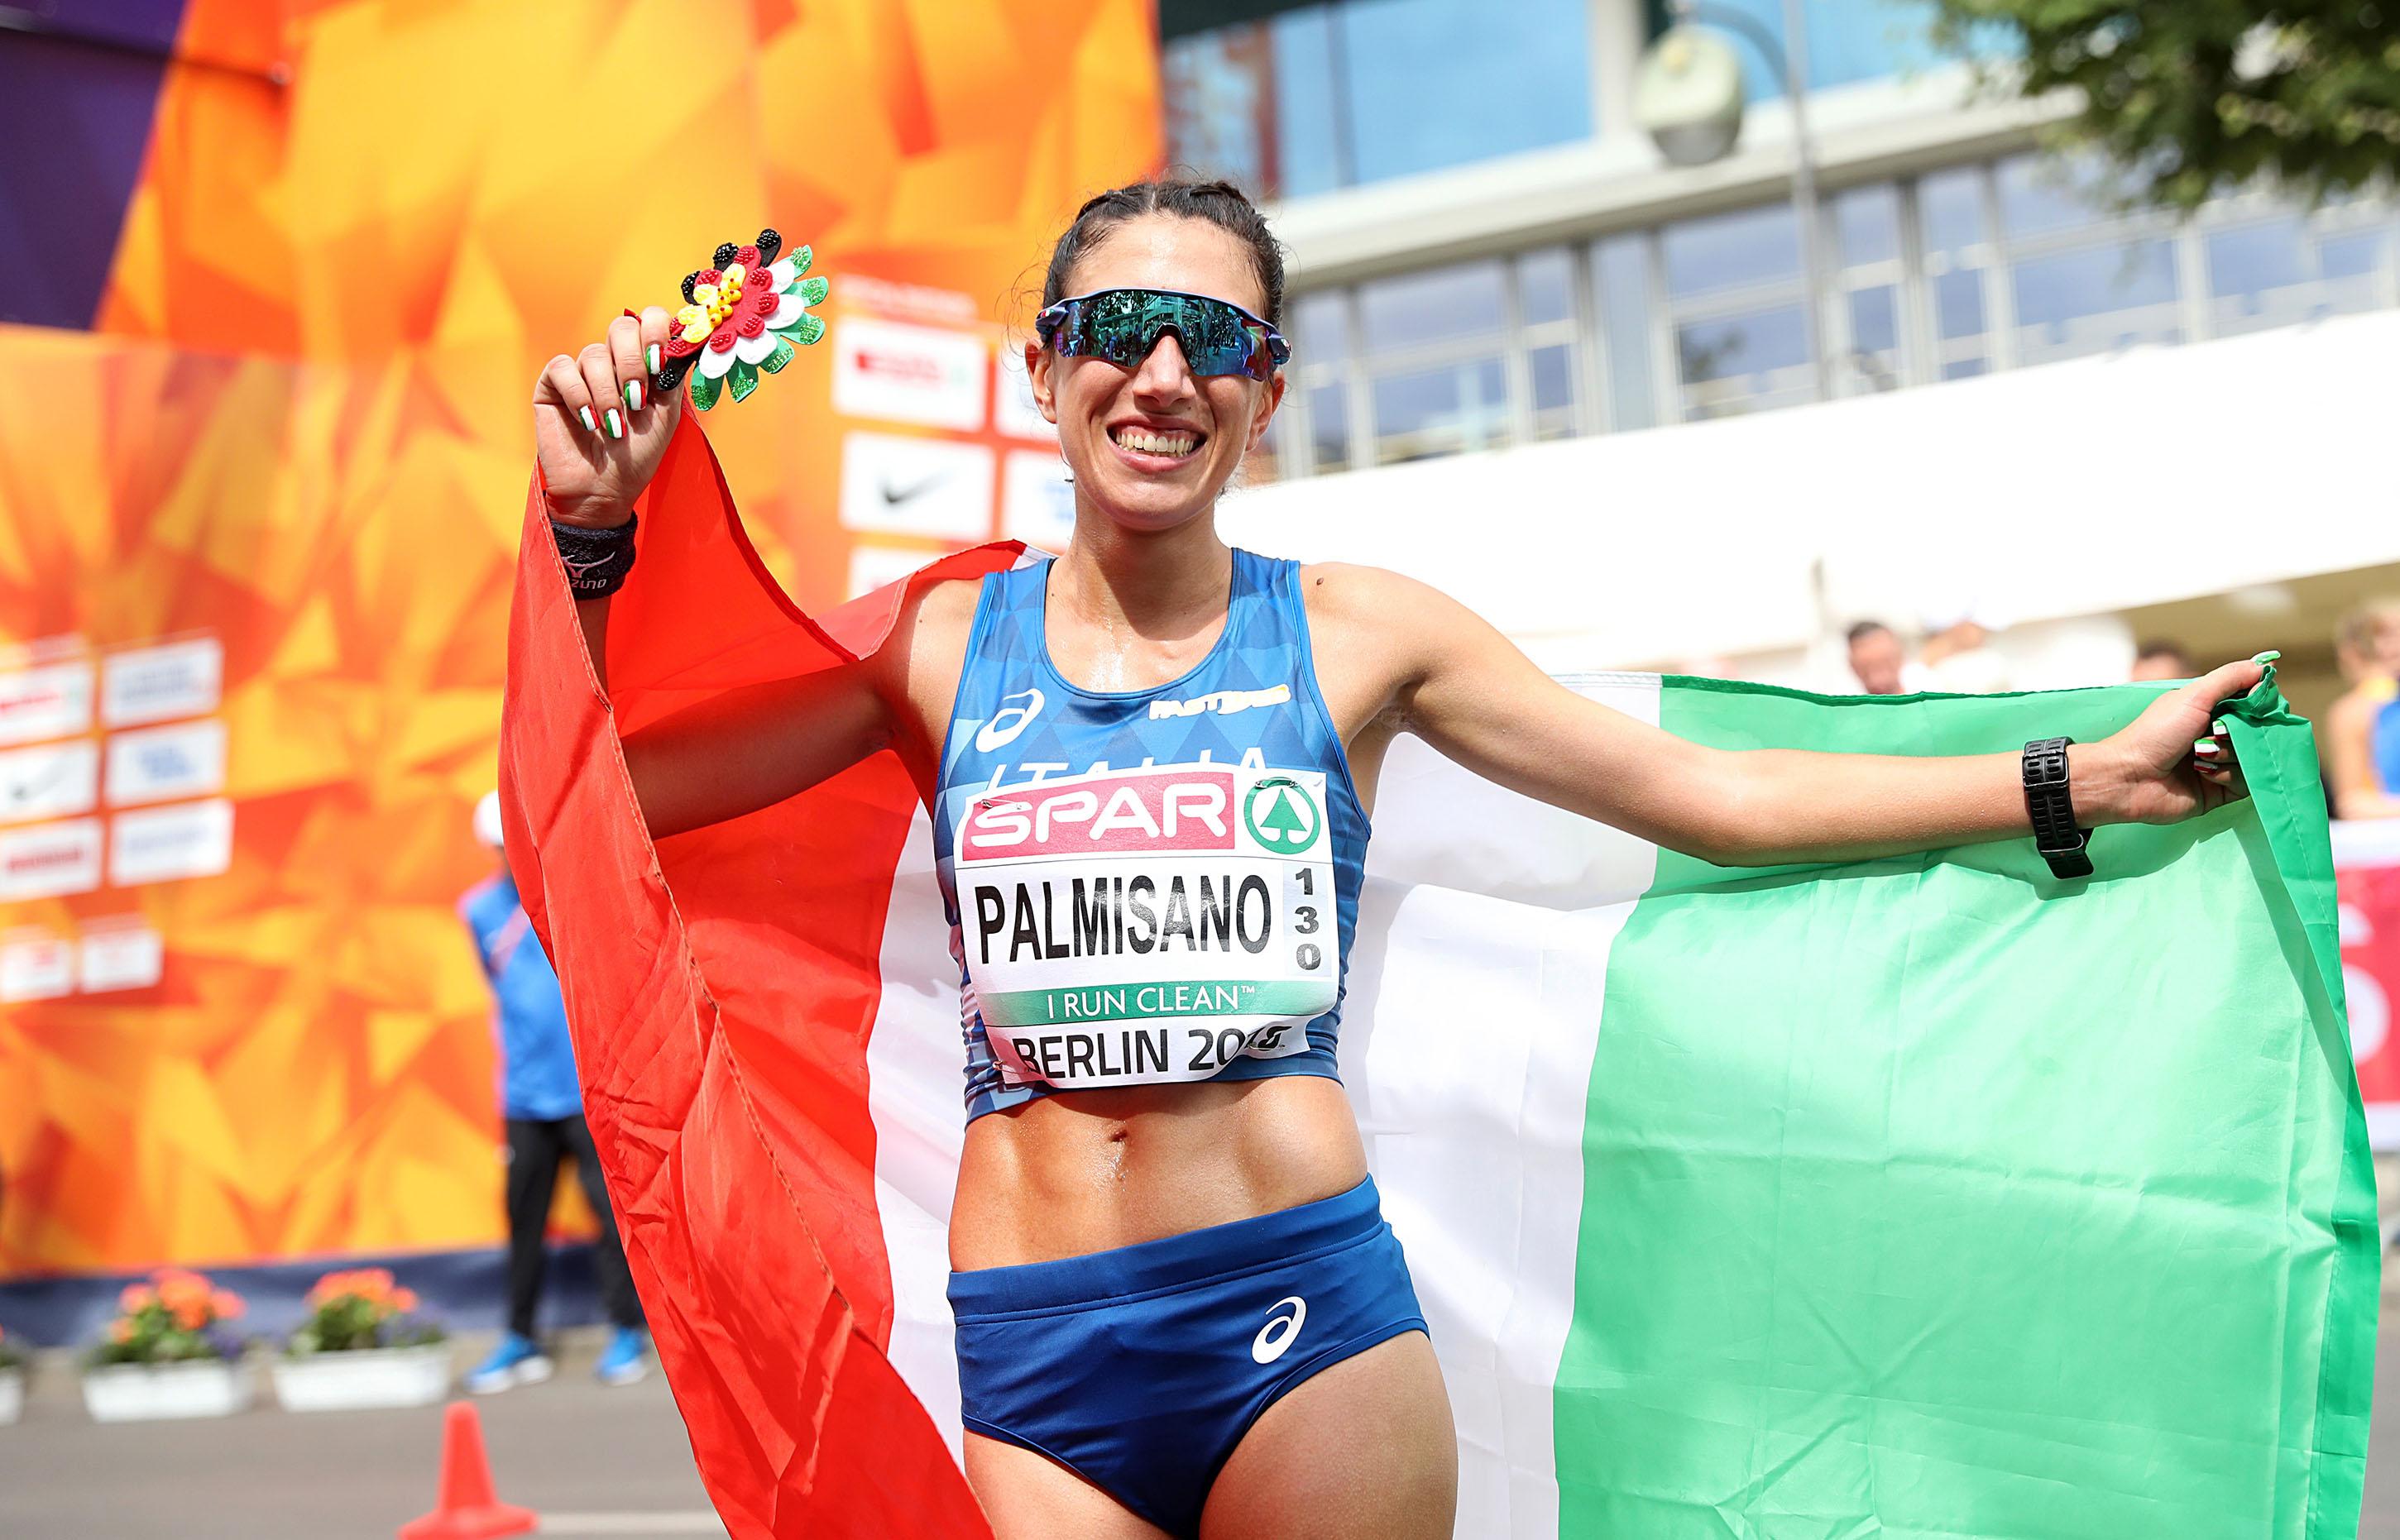 Atletica |  Campionati Italiani Endurance |  vittorie di Palmisano |  Fortunato |  gemelli Zoghlami